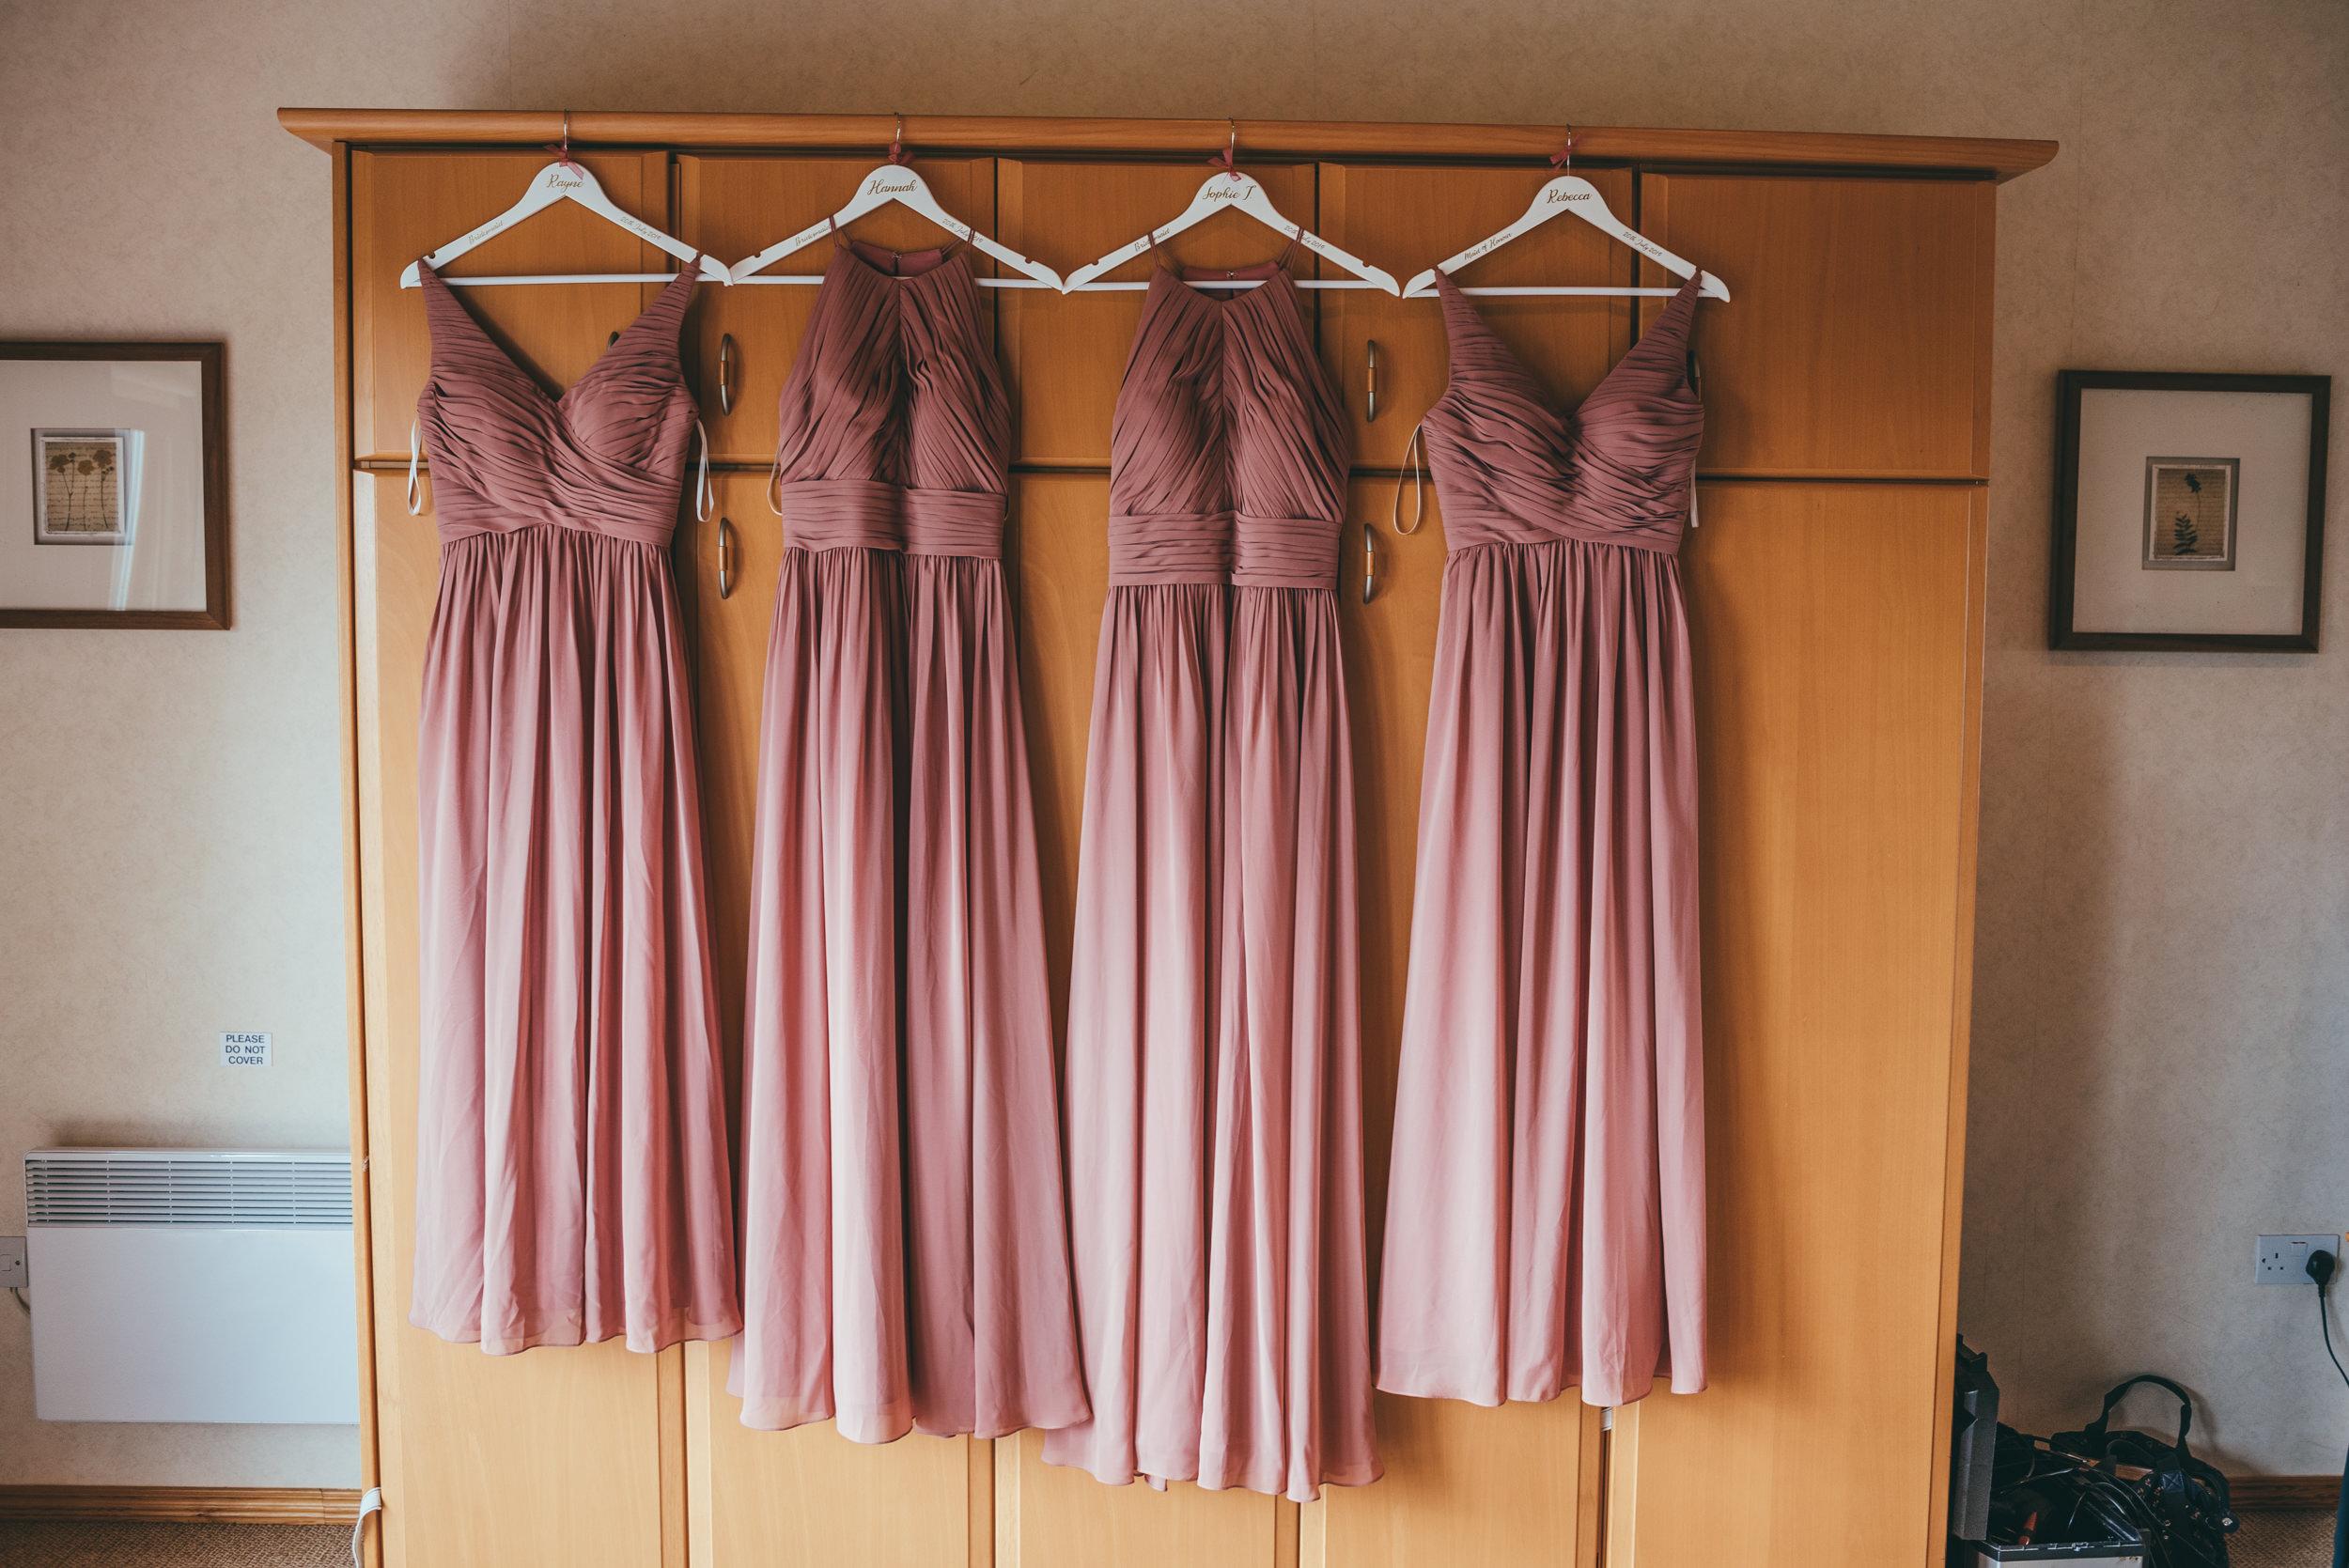 bridesmaids dresses at Belton Woods hotel